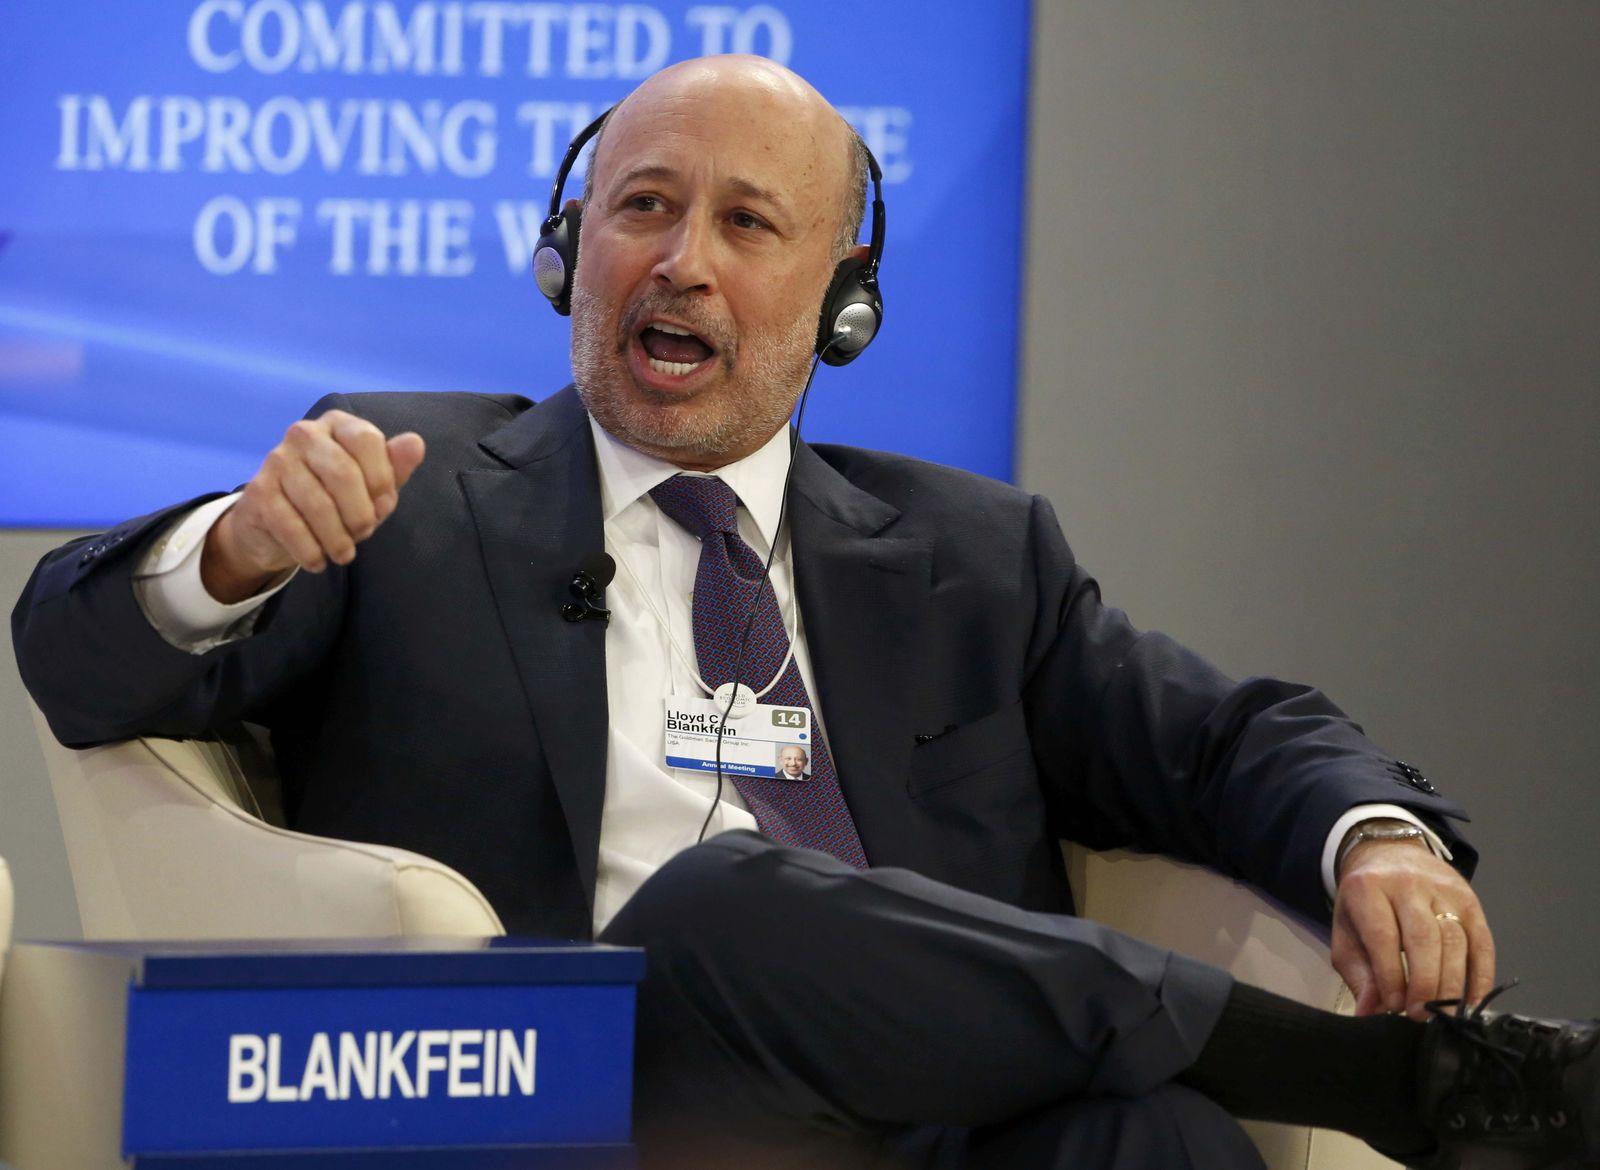 DAVOS/Goldman Sachs Blankfein